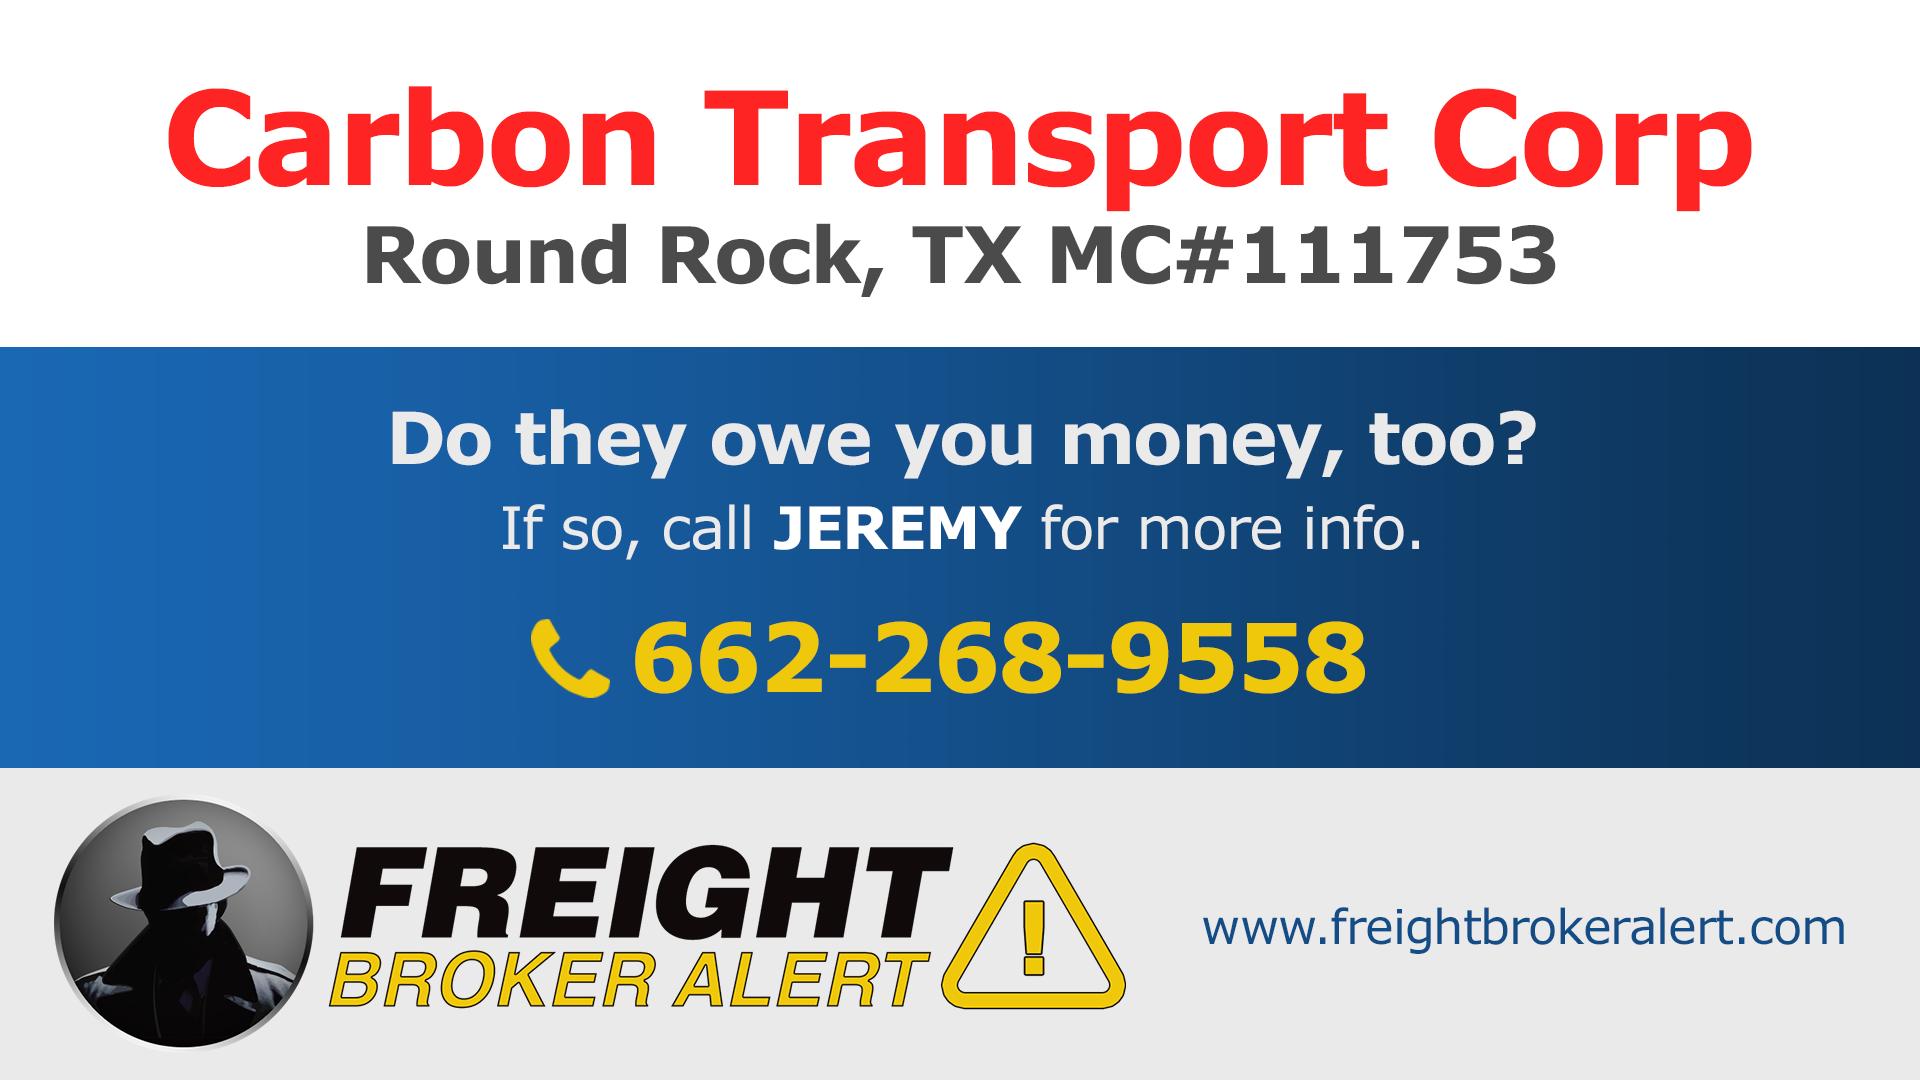 Carbon Transport Corp Texas